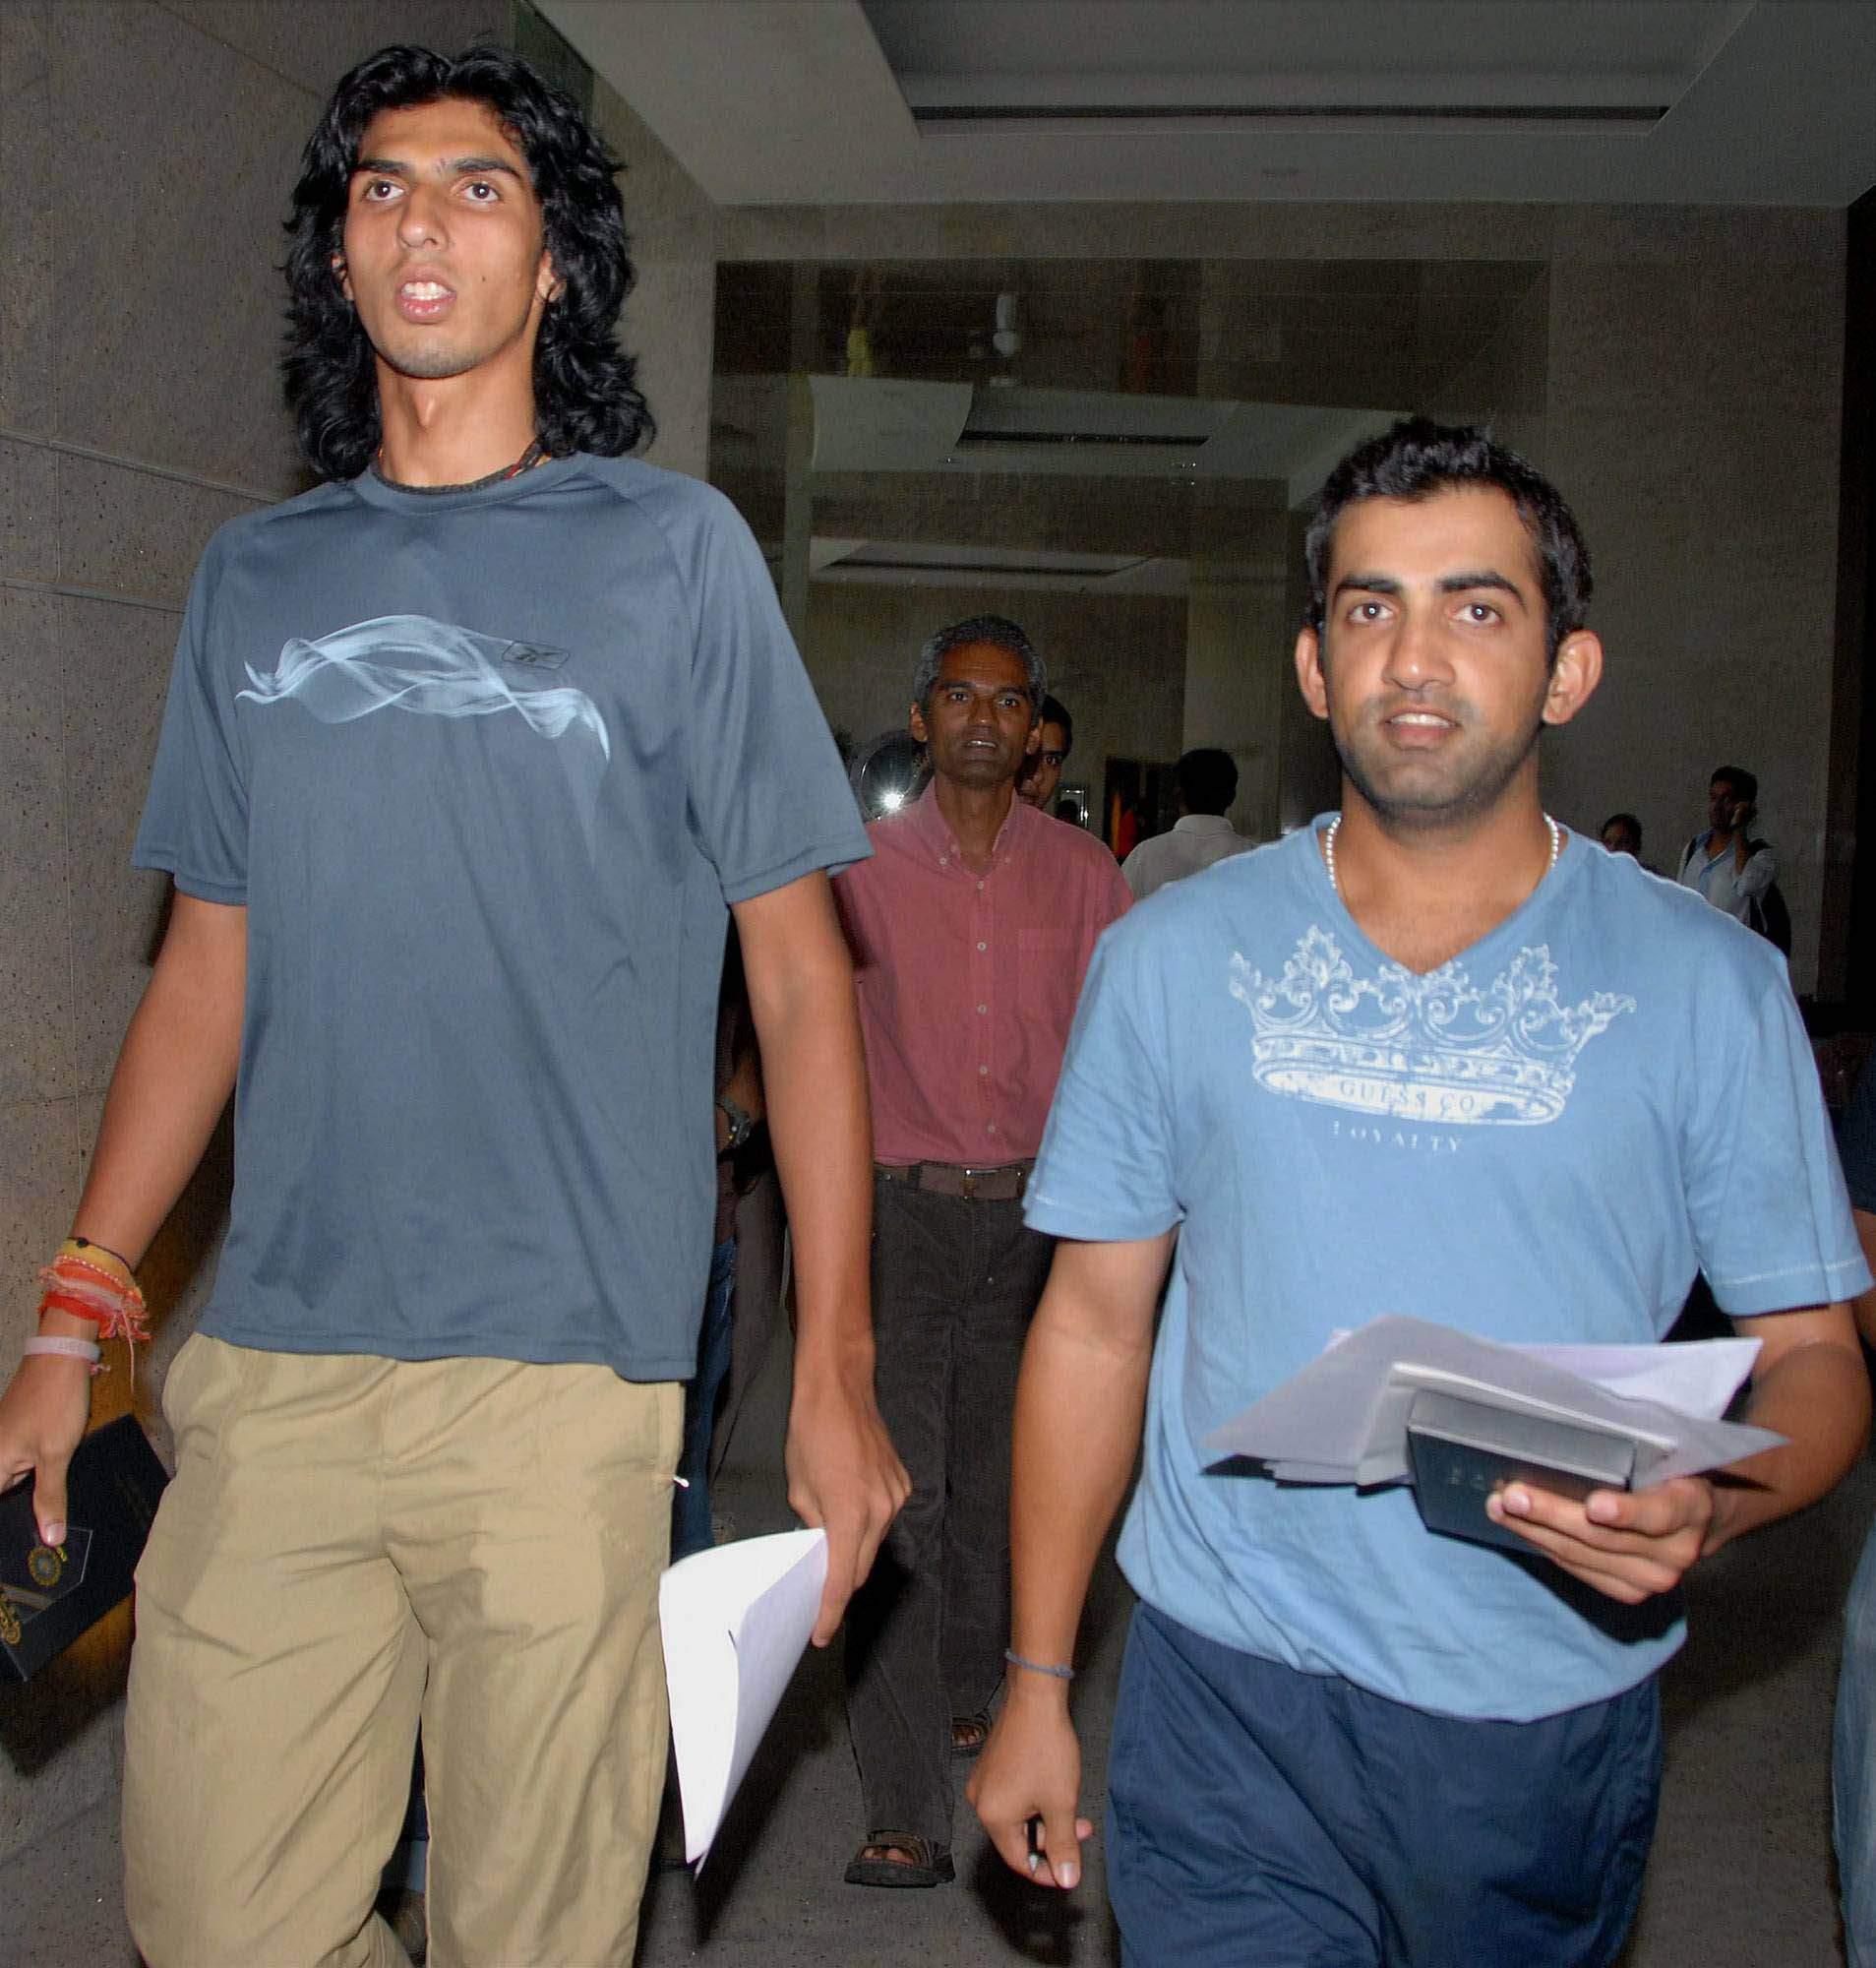 22. A Rare Pic Of Ishanth Sharma And Gautam Gambhir